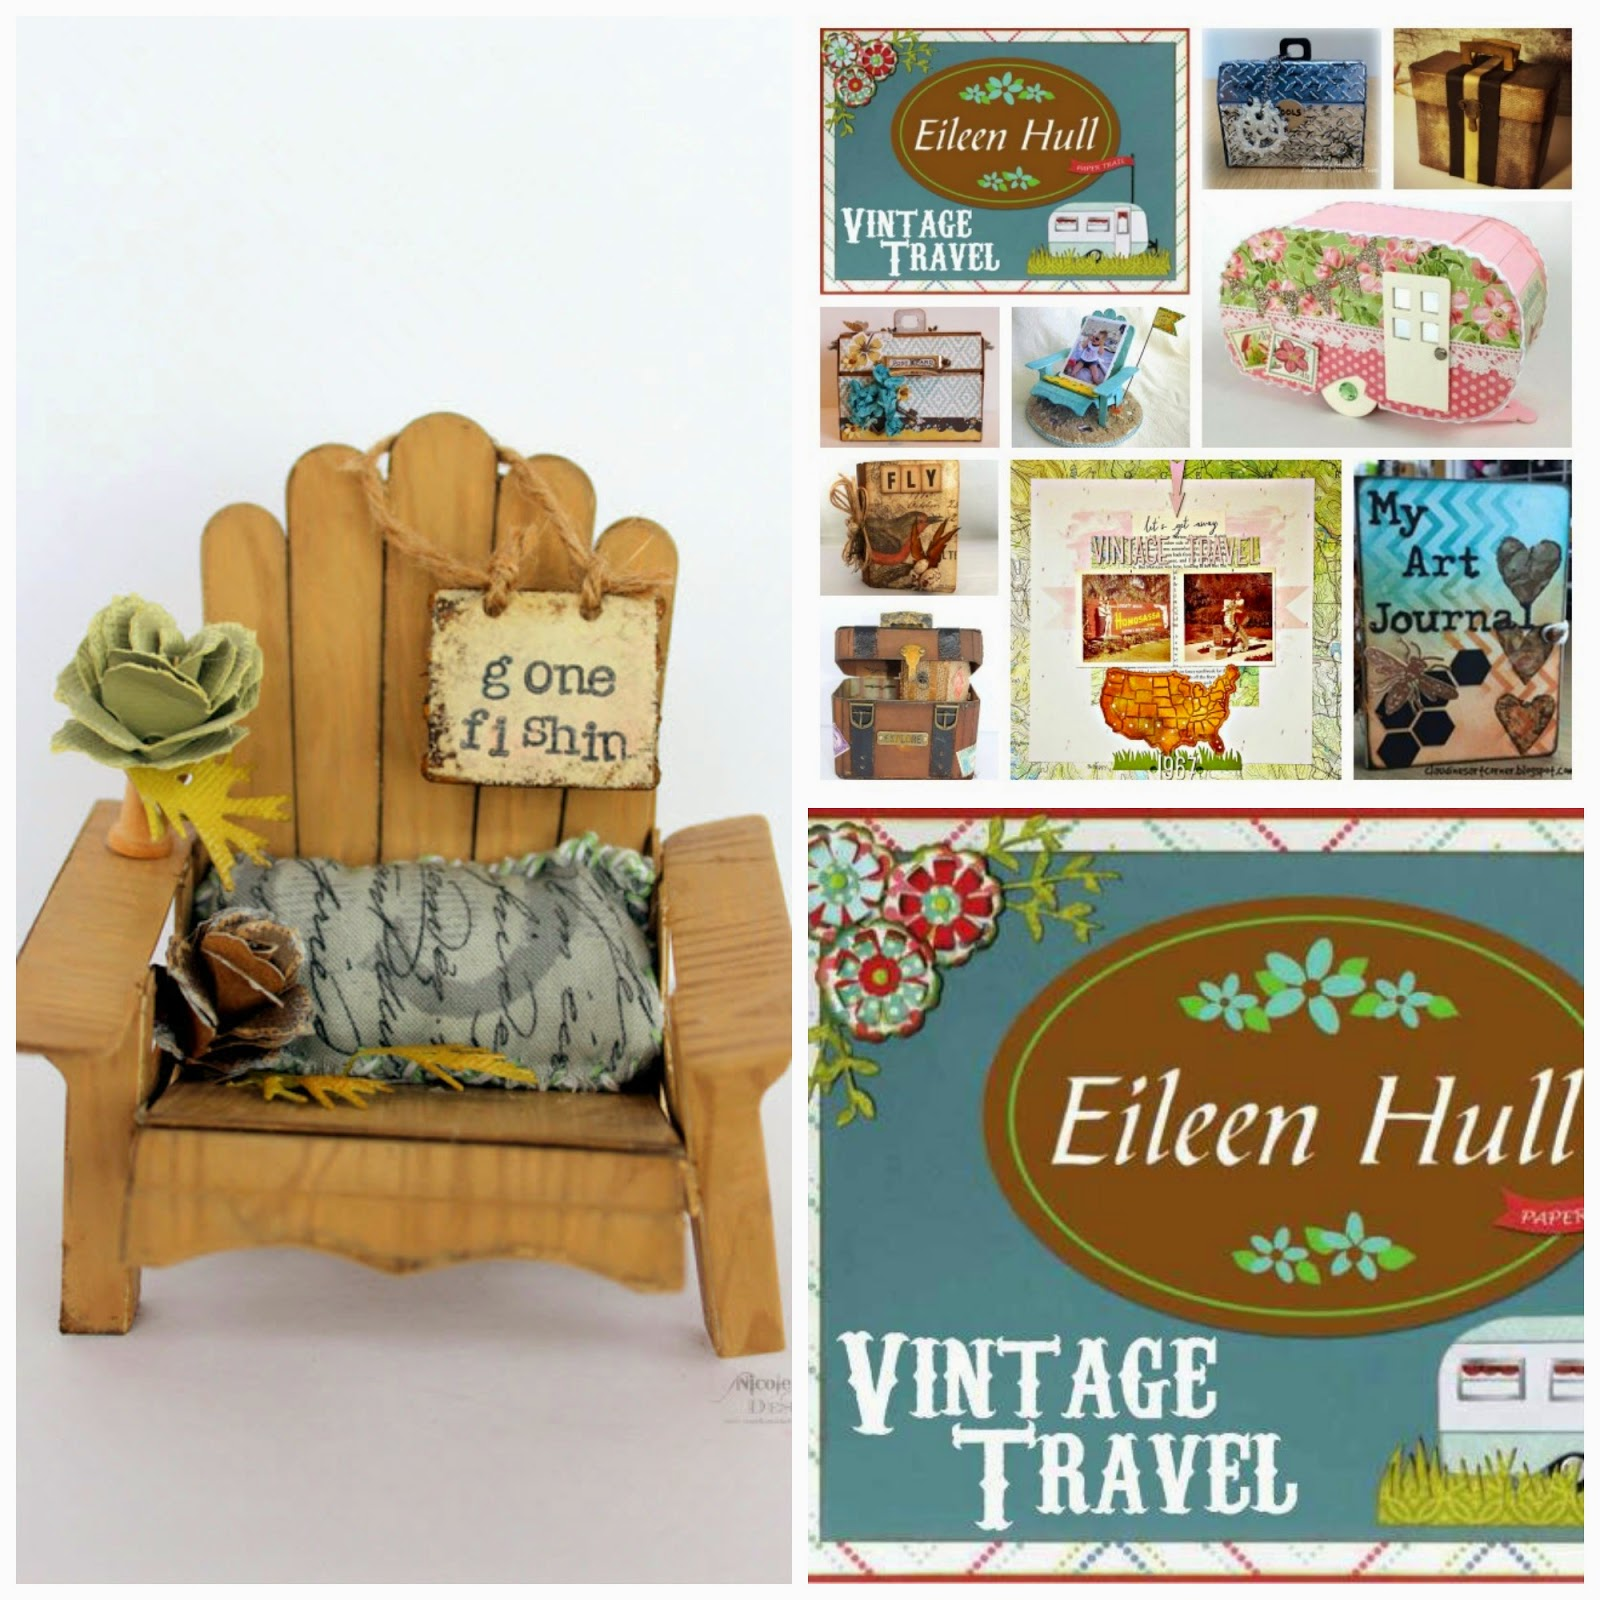 Vintage Travel CHA Release- Adirondack Chair